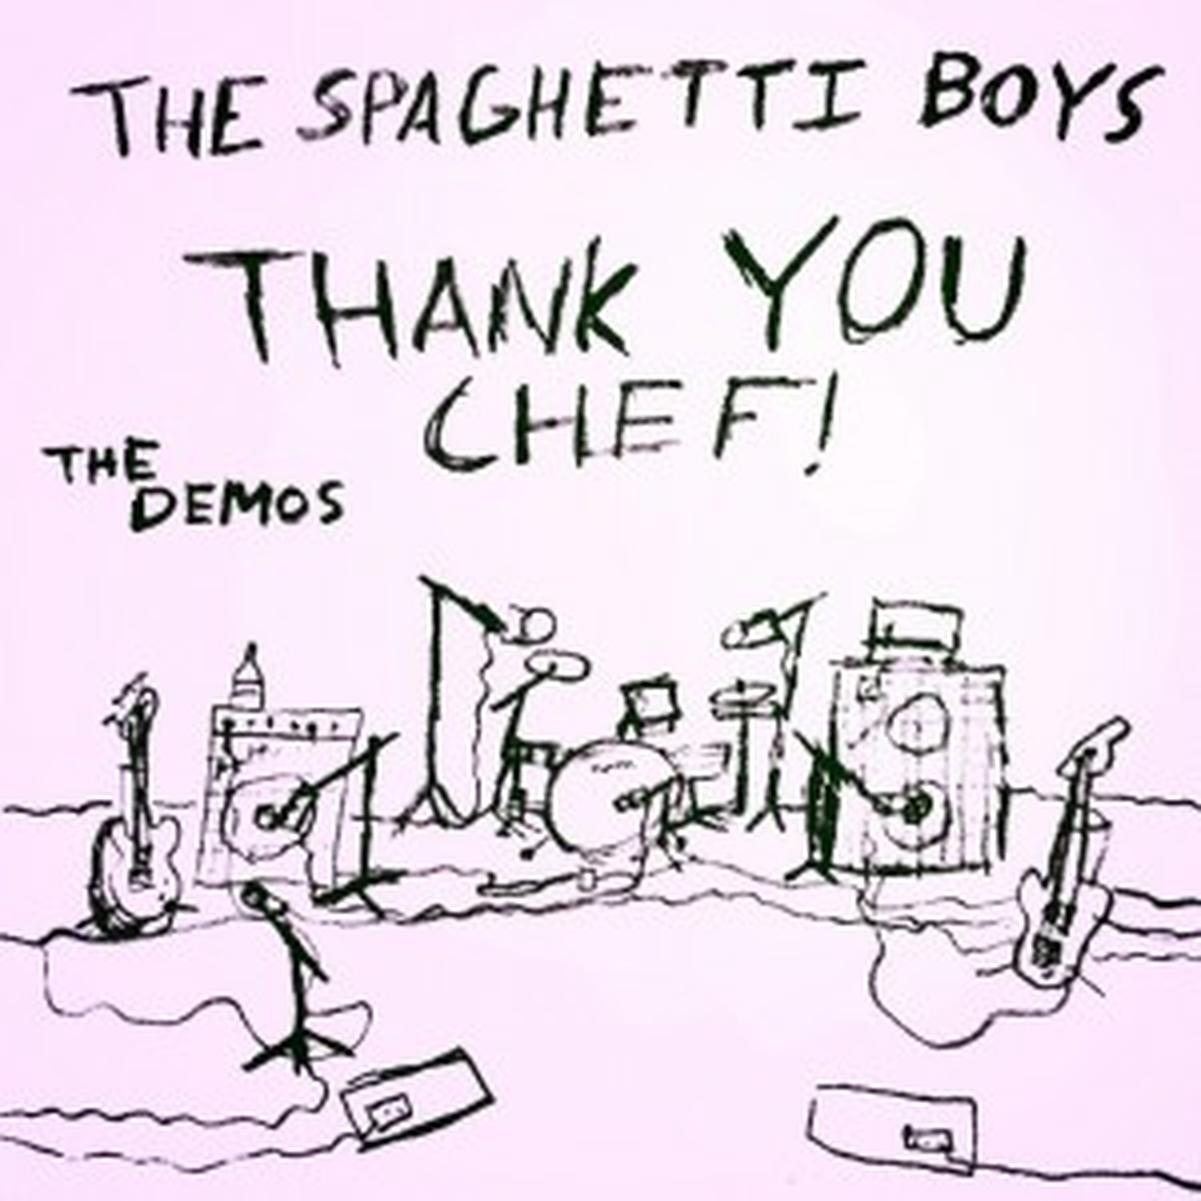 The Spaghetti Boys